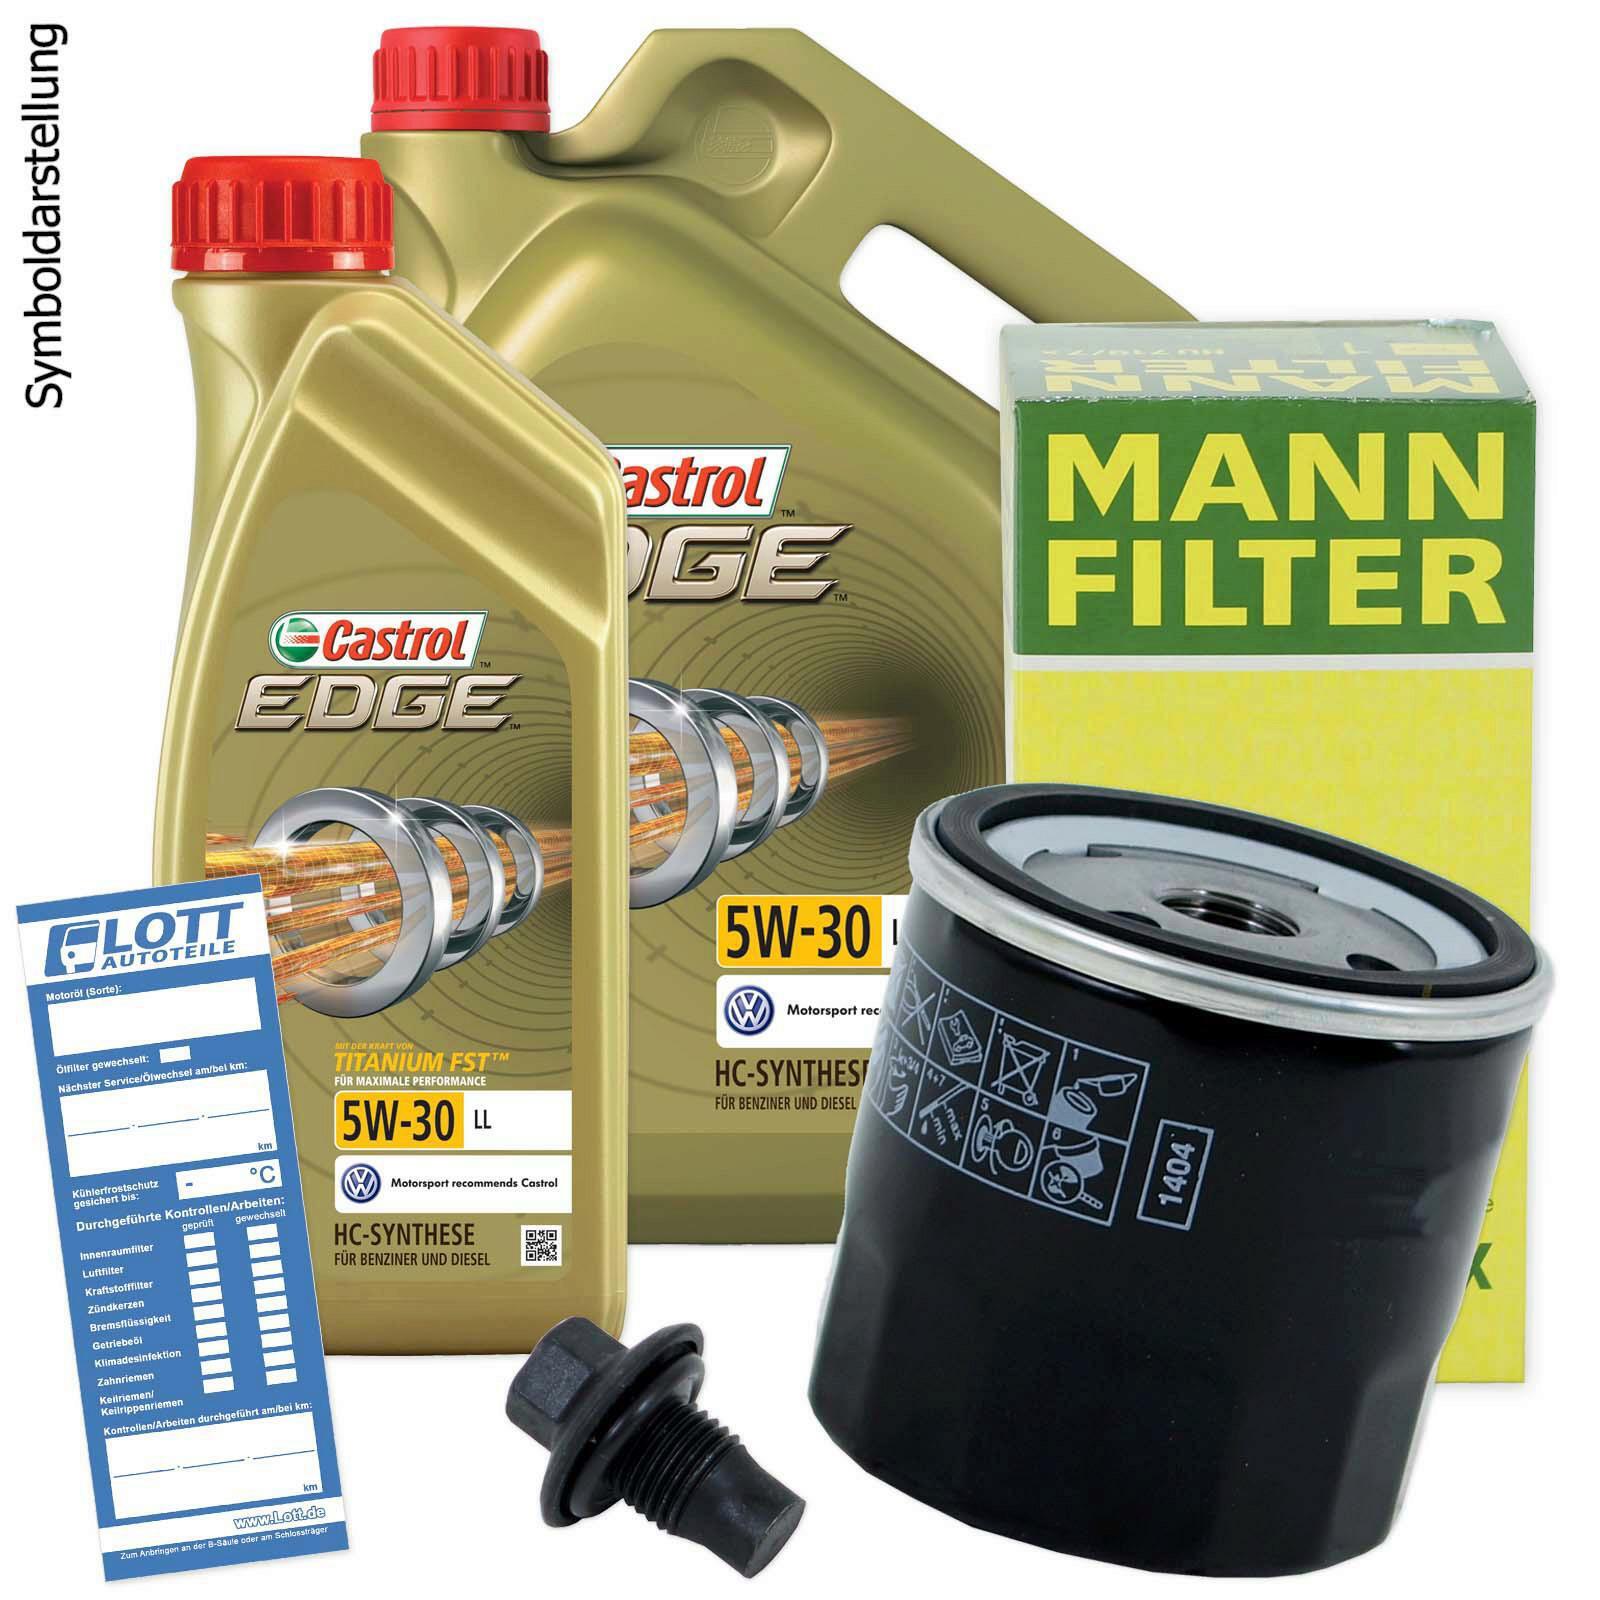 Ölwechsel Set 6L 5W30 Öl Motoröl CASTROL + MANN Ölfilter + Ablassschraube